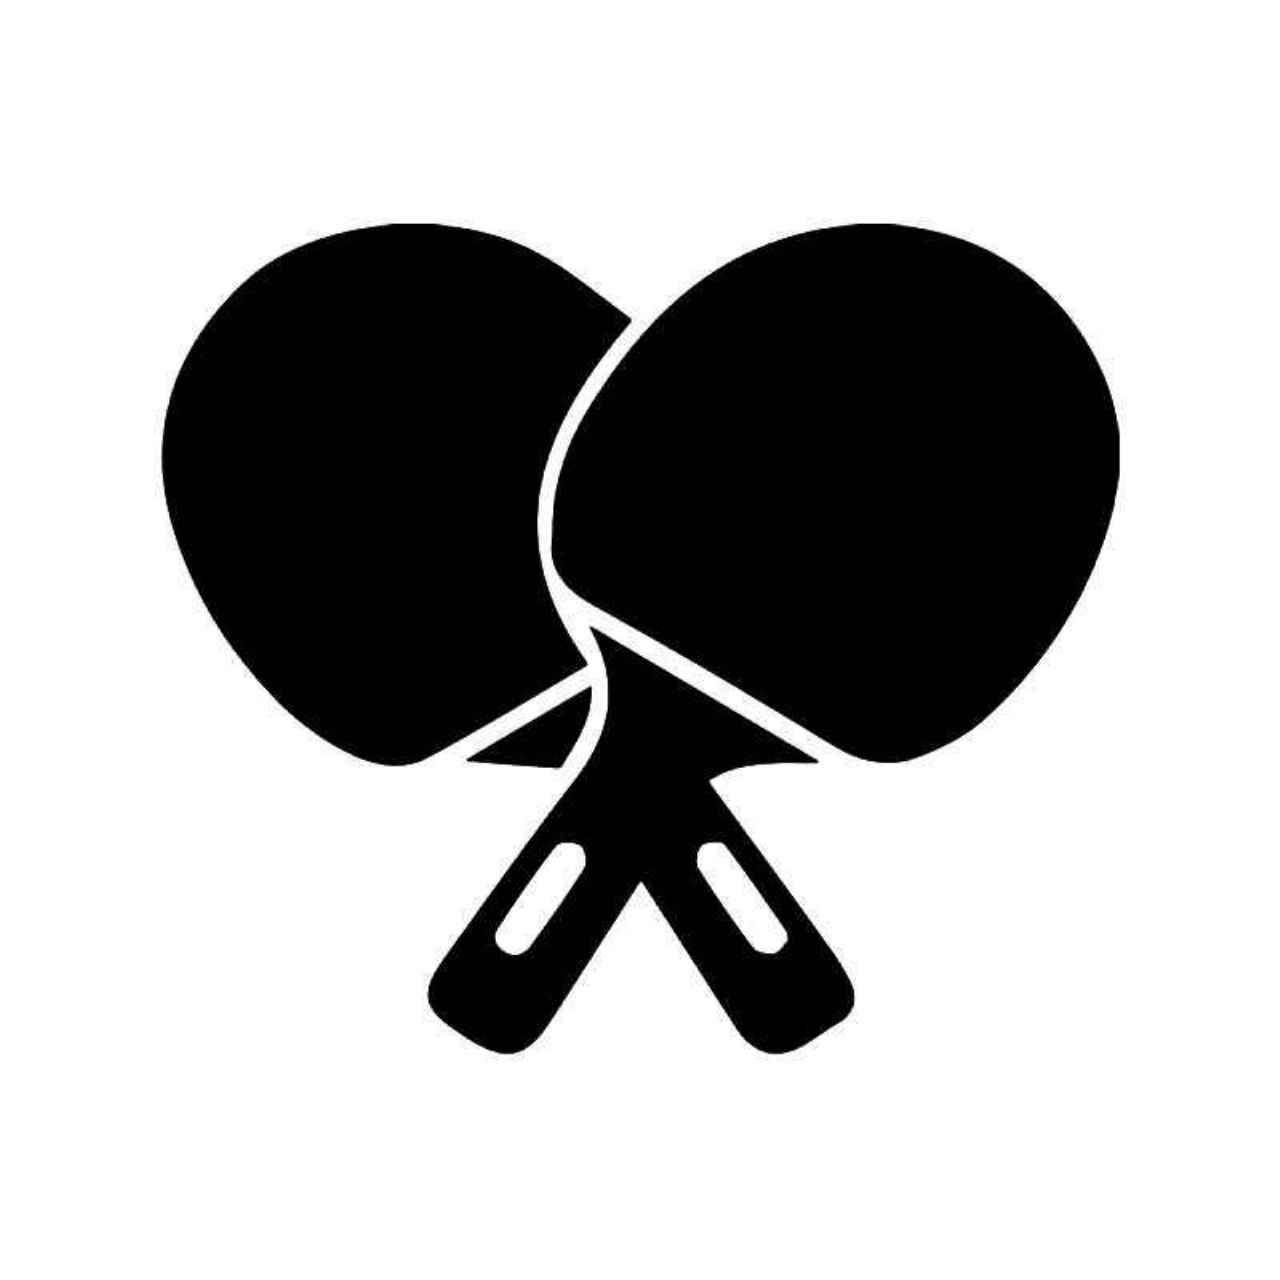 Table Tennis Ping Pong Paddles Vinyl Decal Sticker   Pinterest